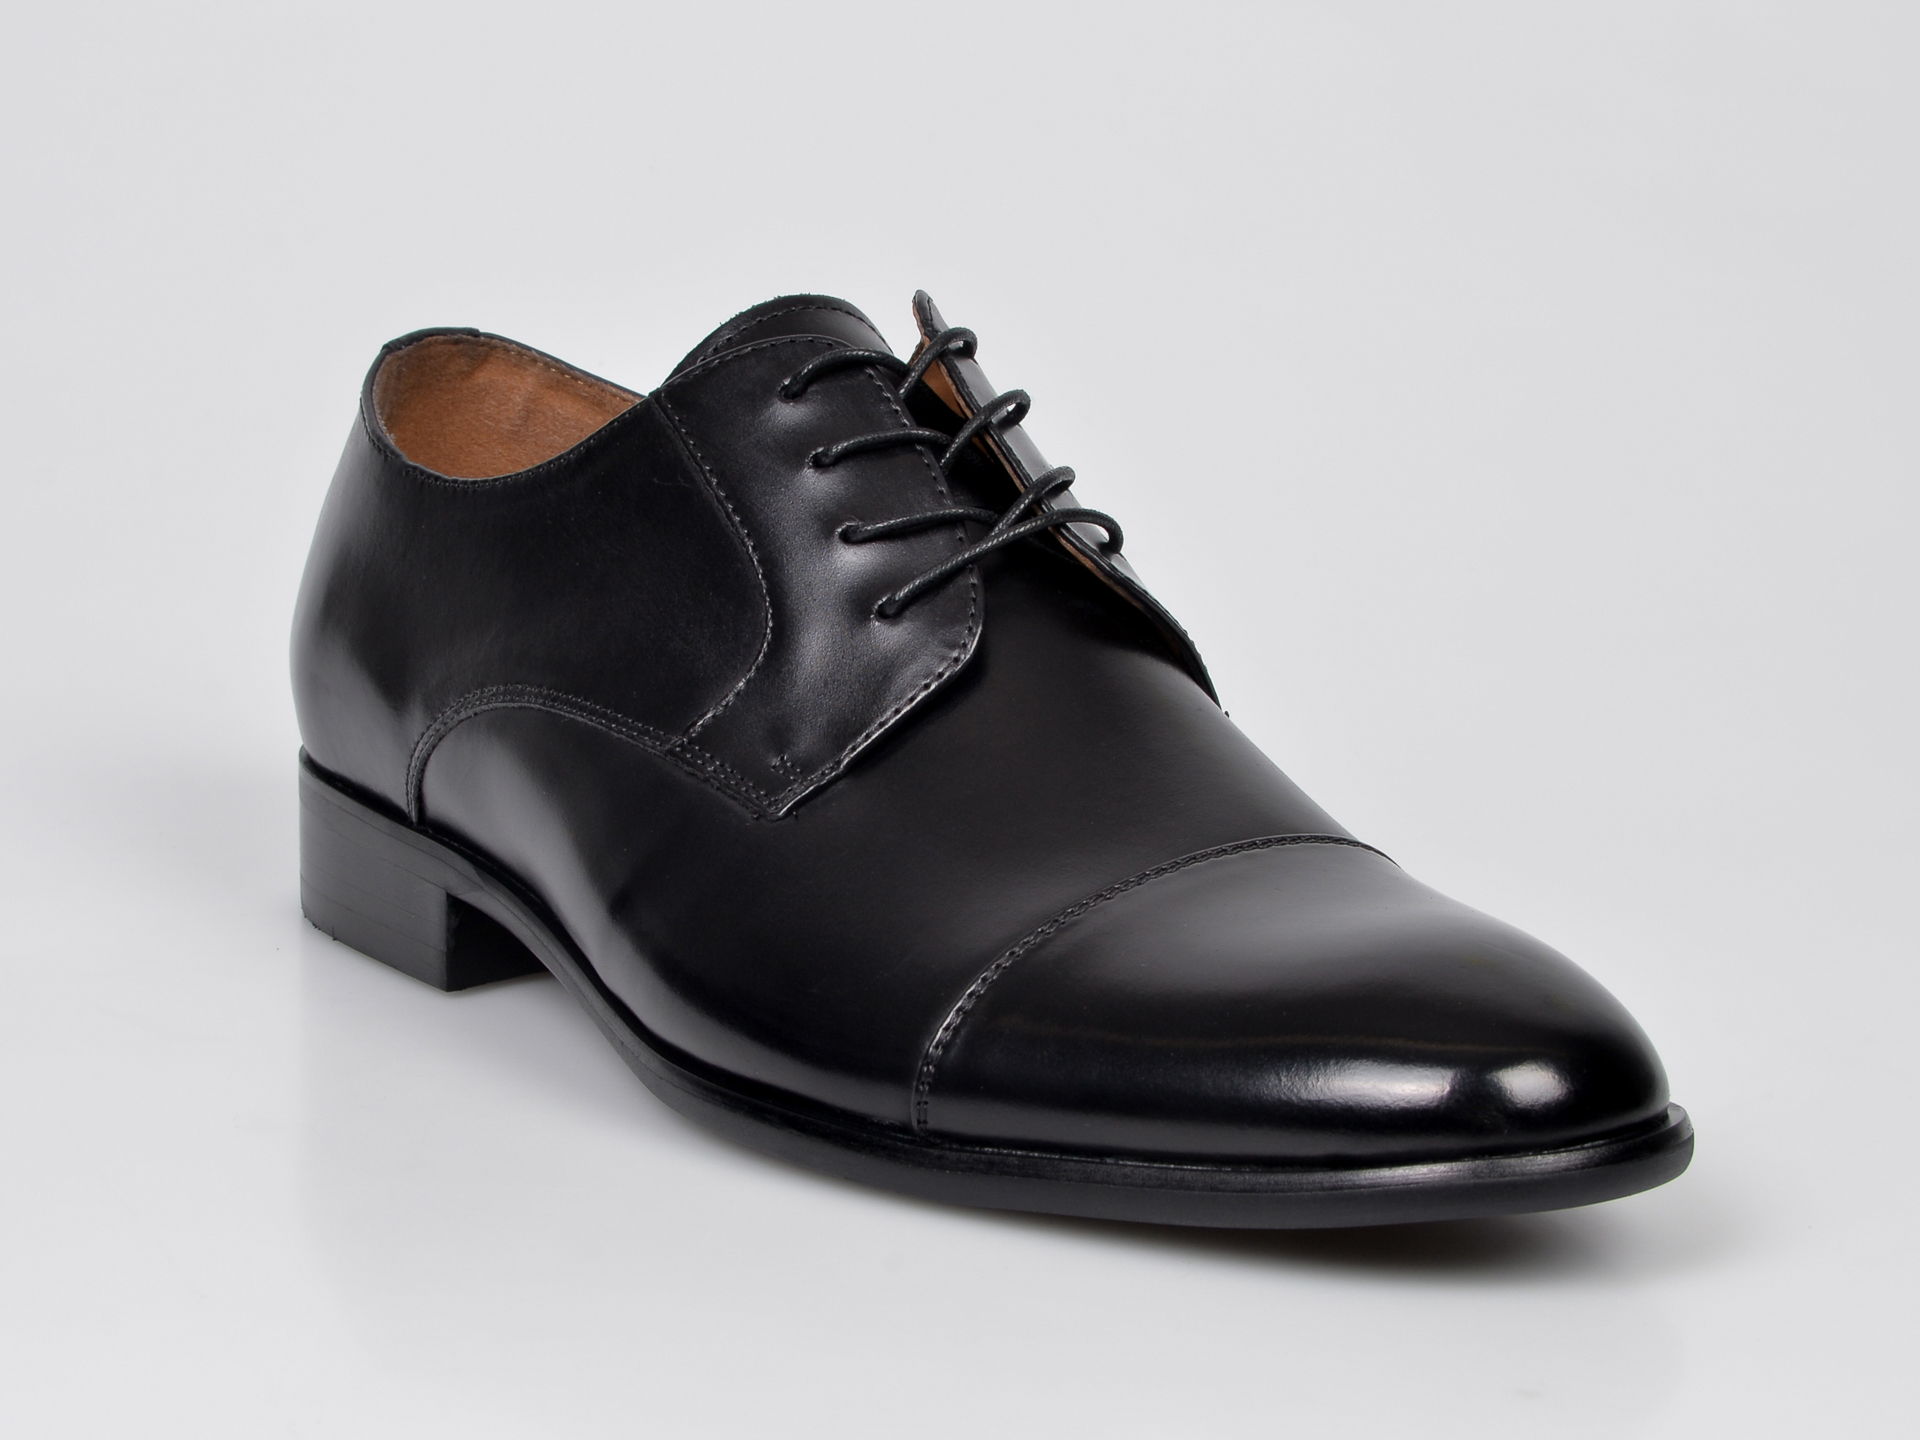 Pantofi Aldo Negri, Gallerang-r, Din Piele Naturala